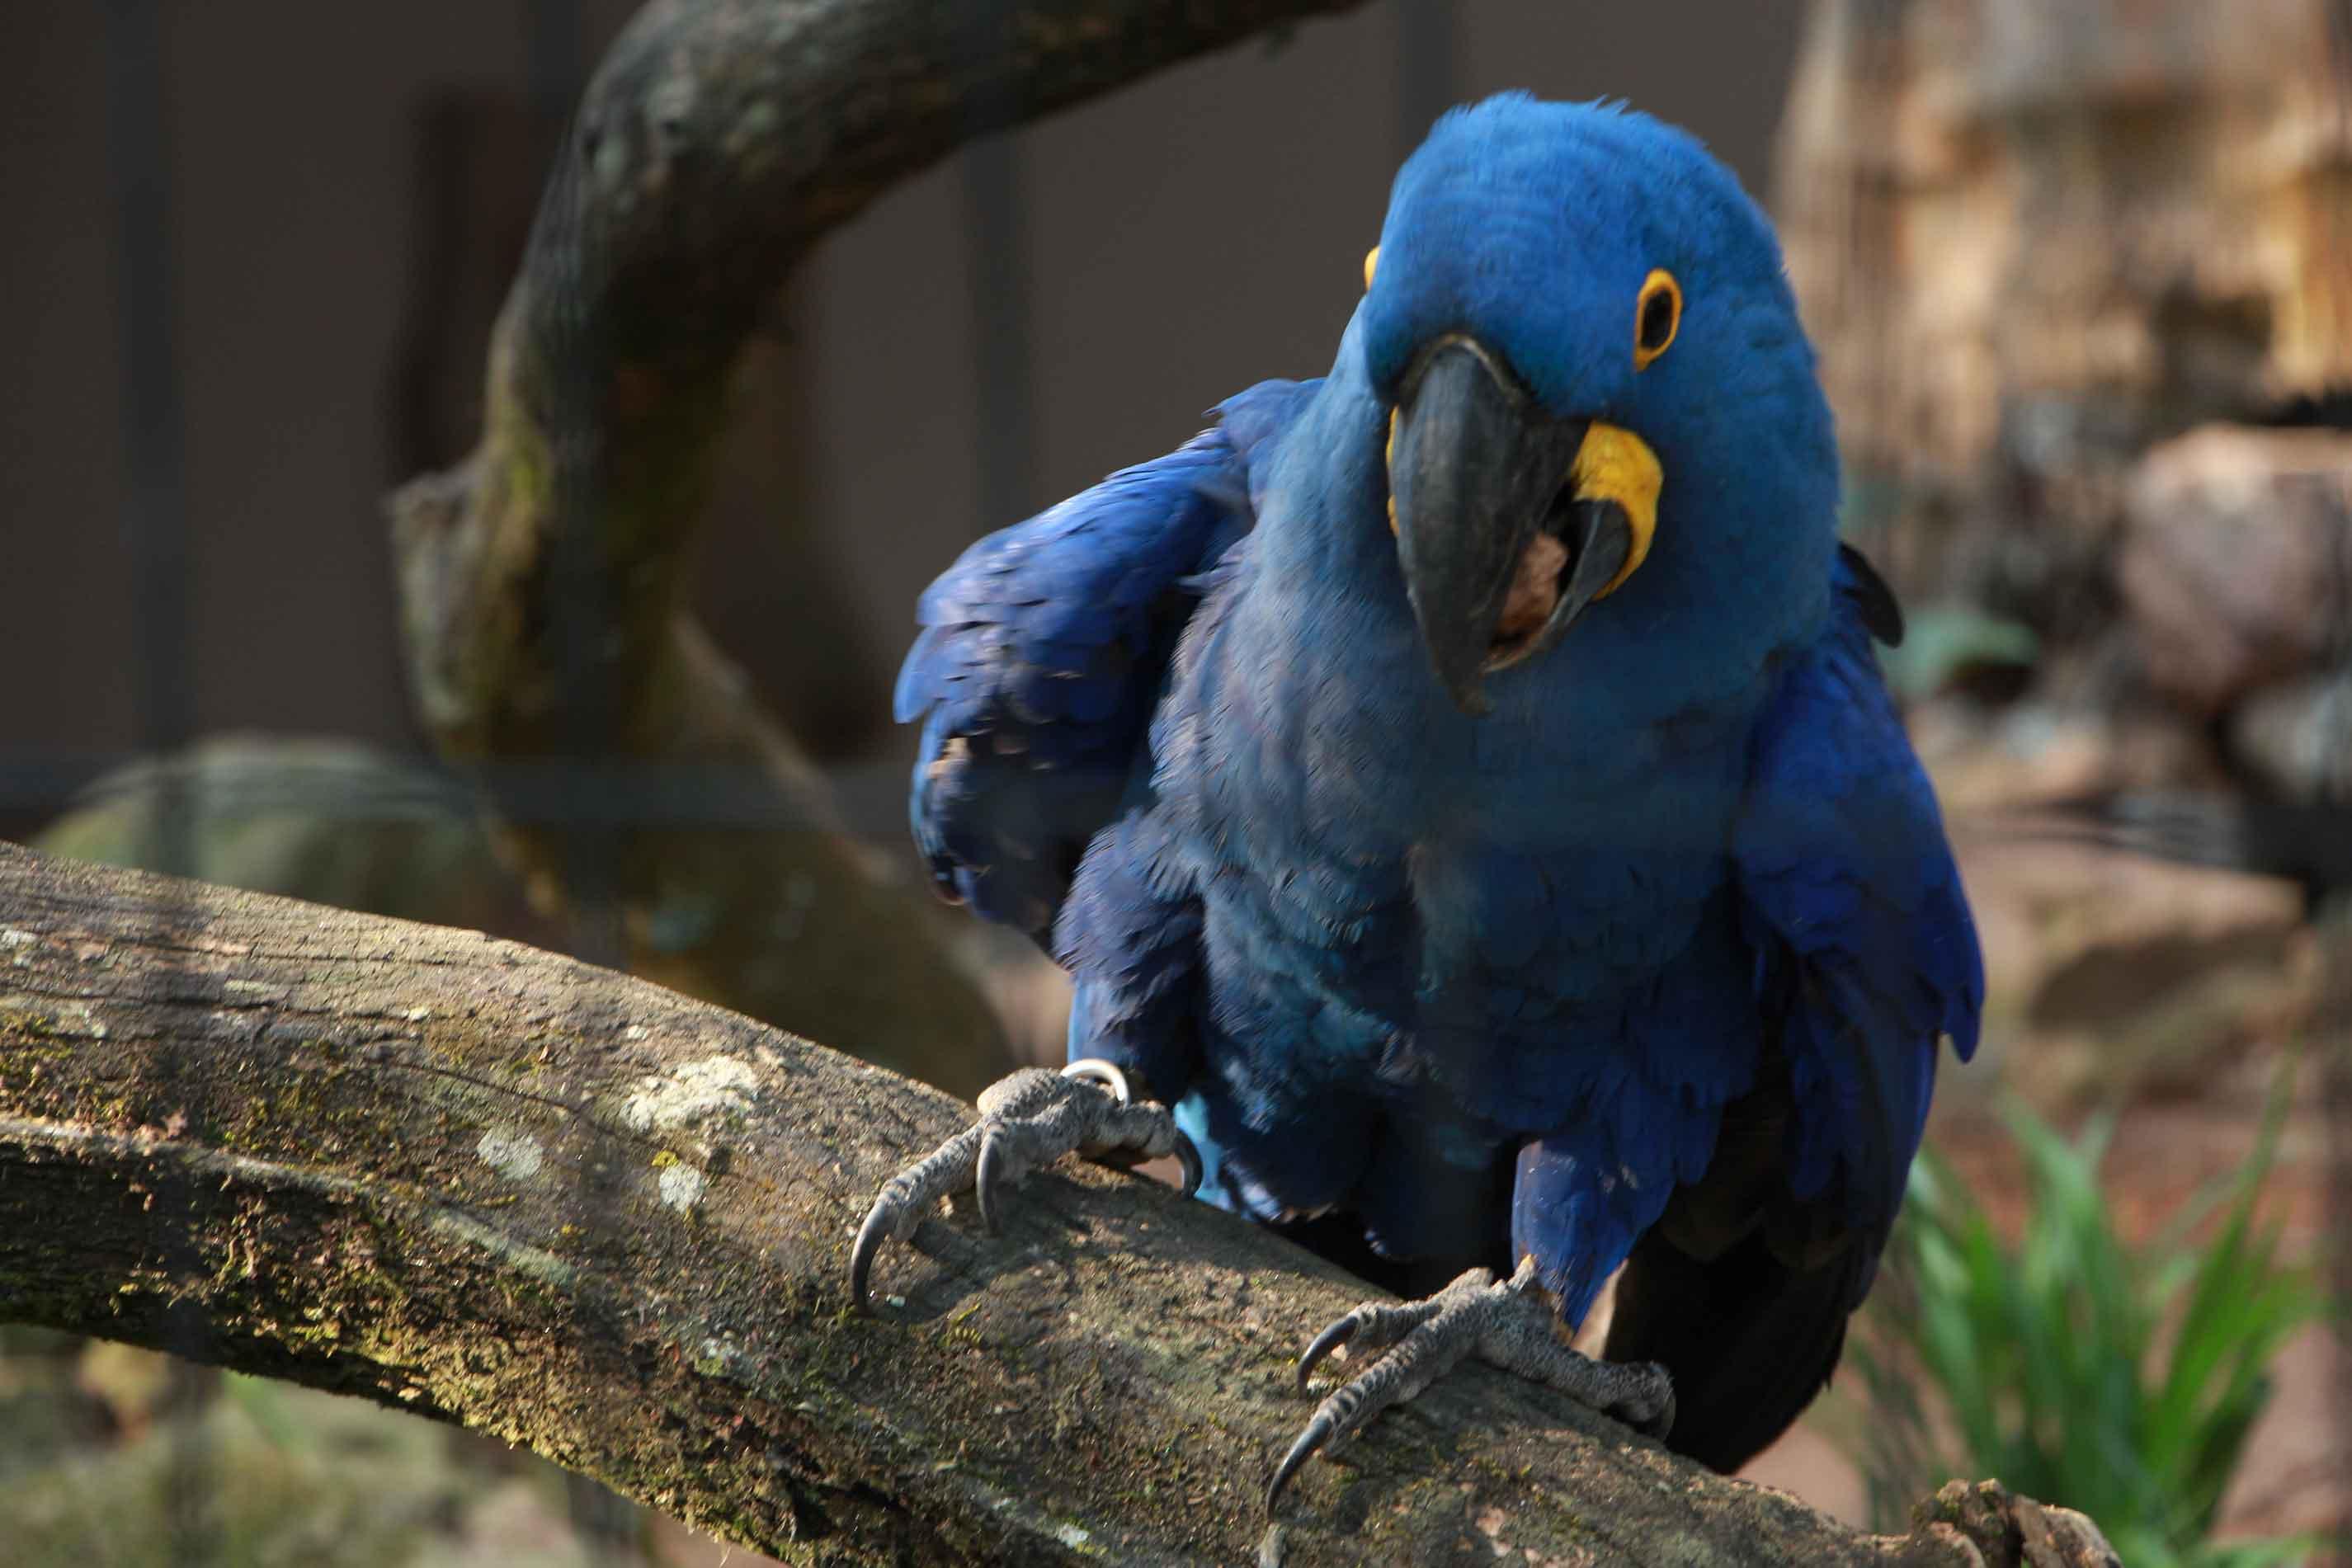 Itatiba-Turismo-Zooparque-Marcio-Masulino-IMG_4278-bx